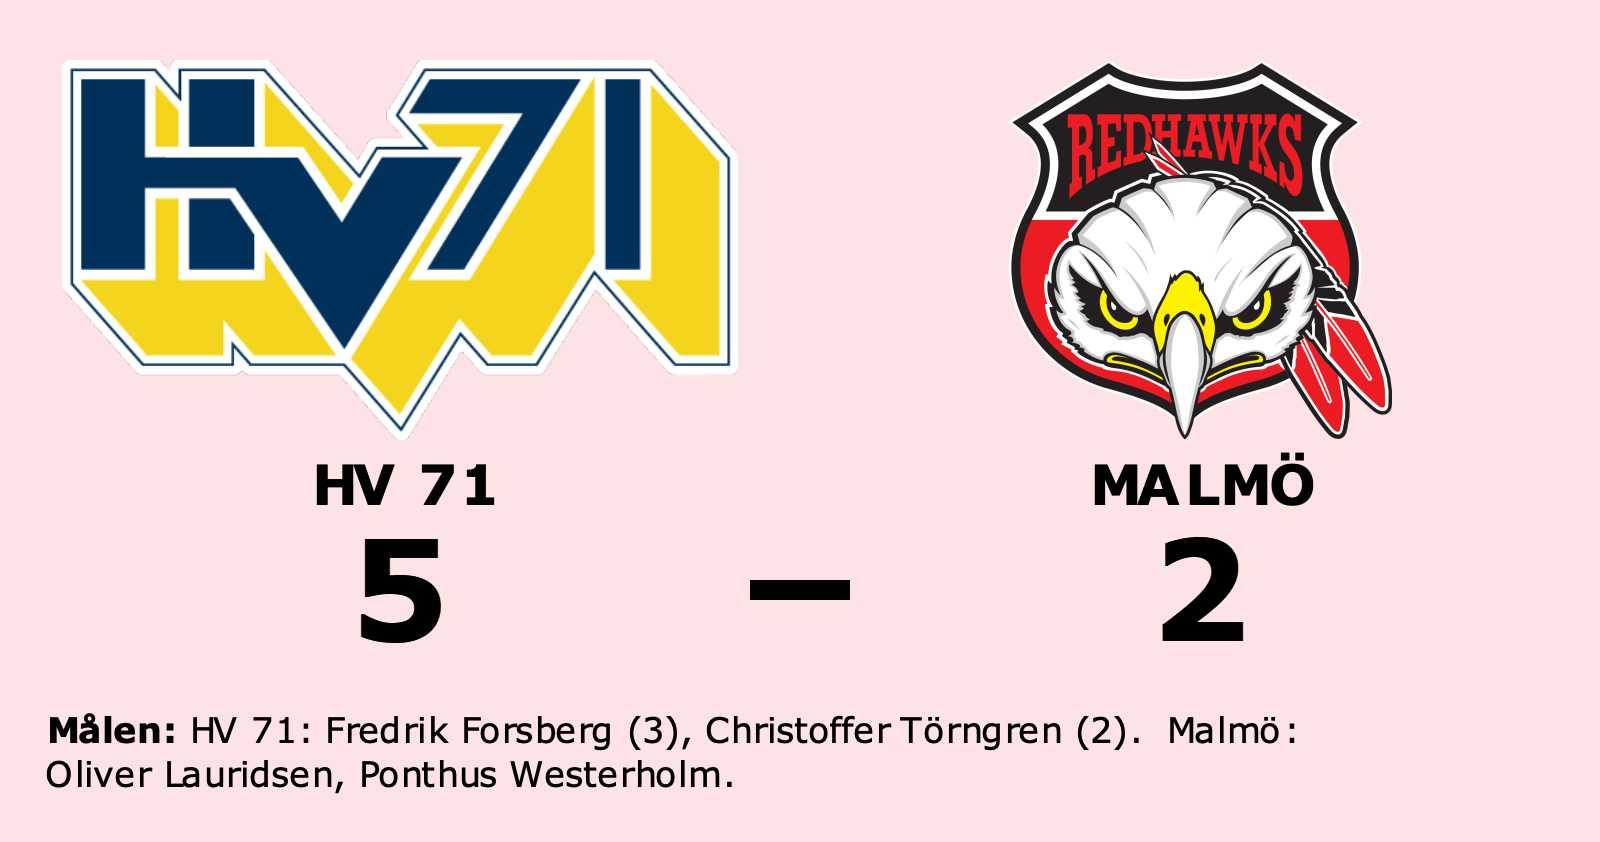 HV 71 vann – efter Fredrik Forsbergs hattrick